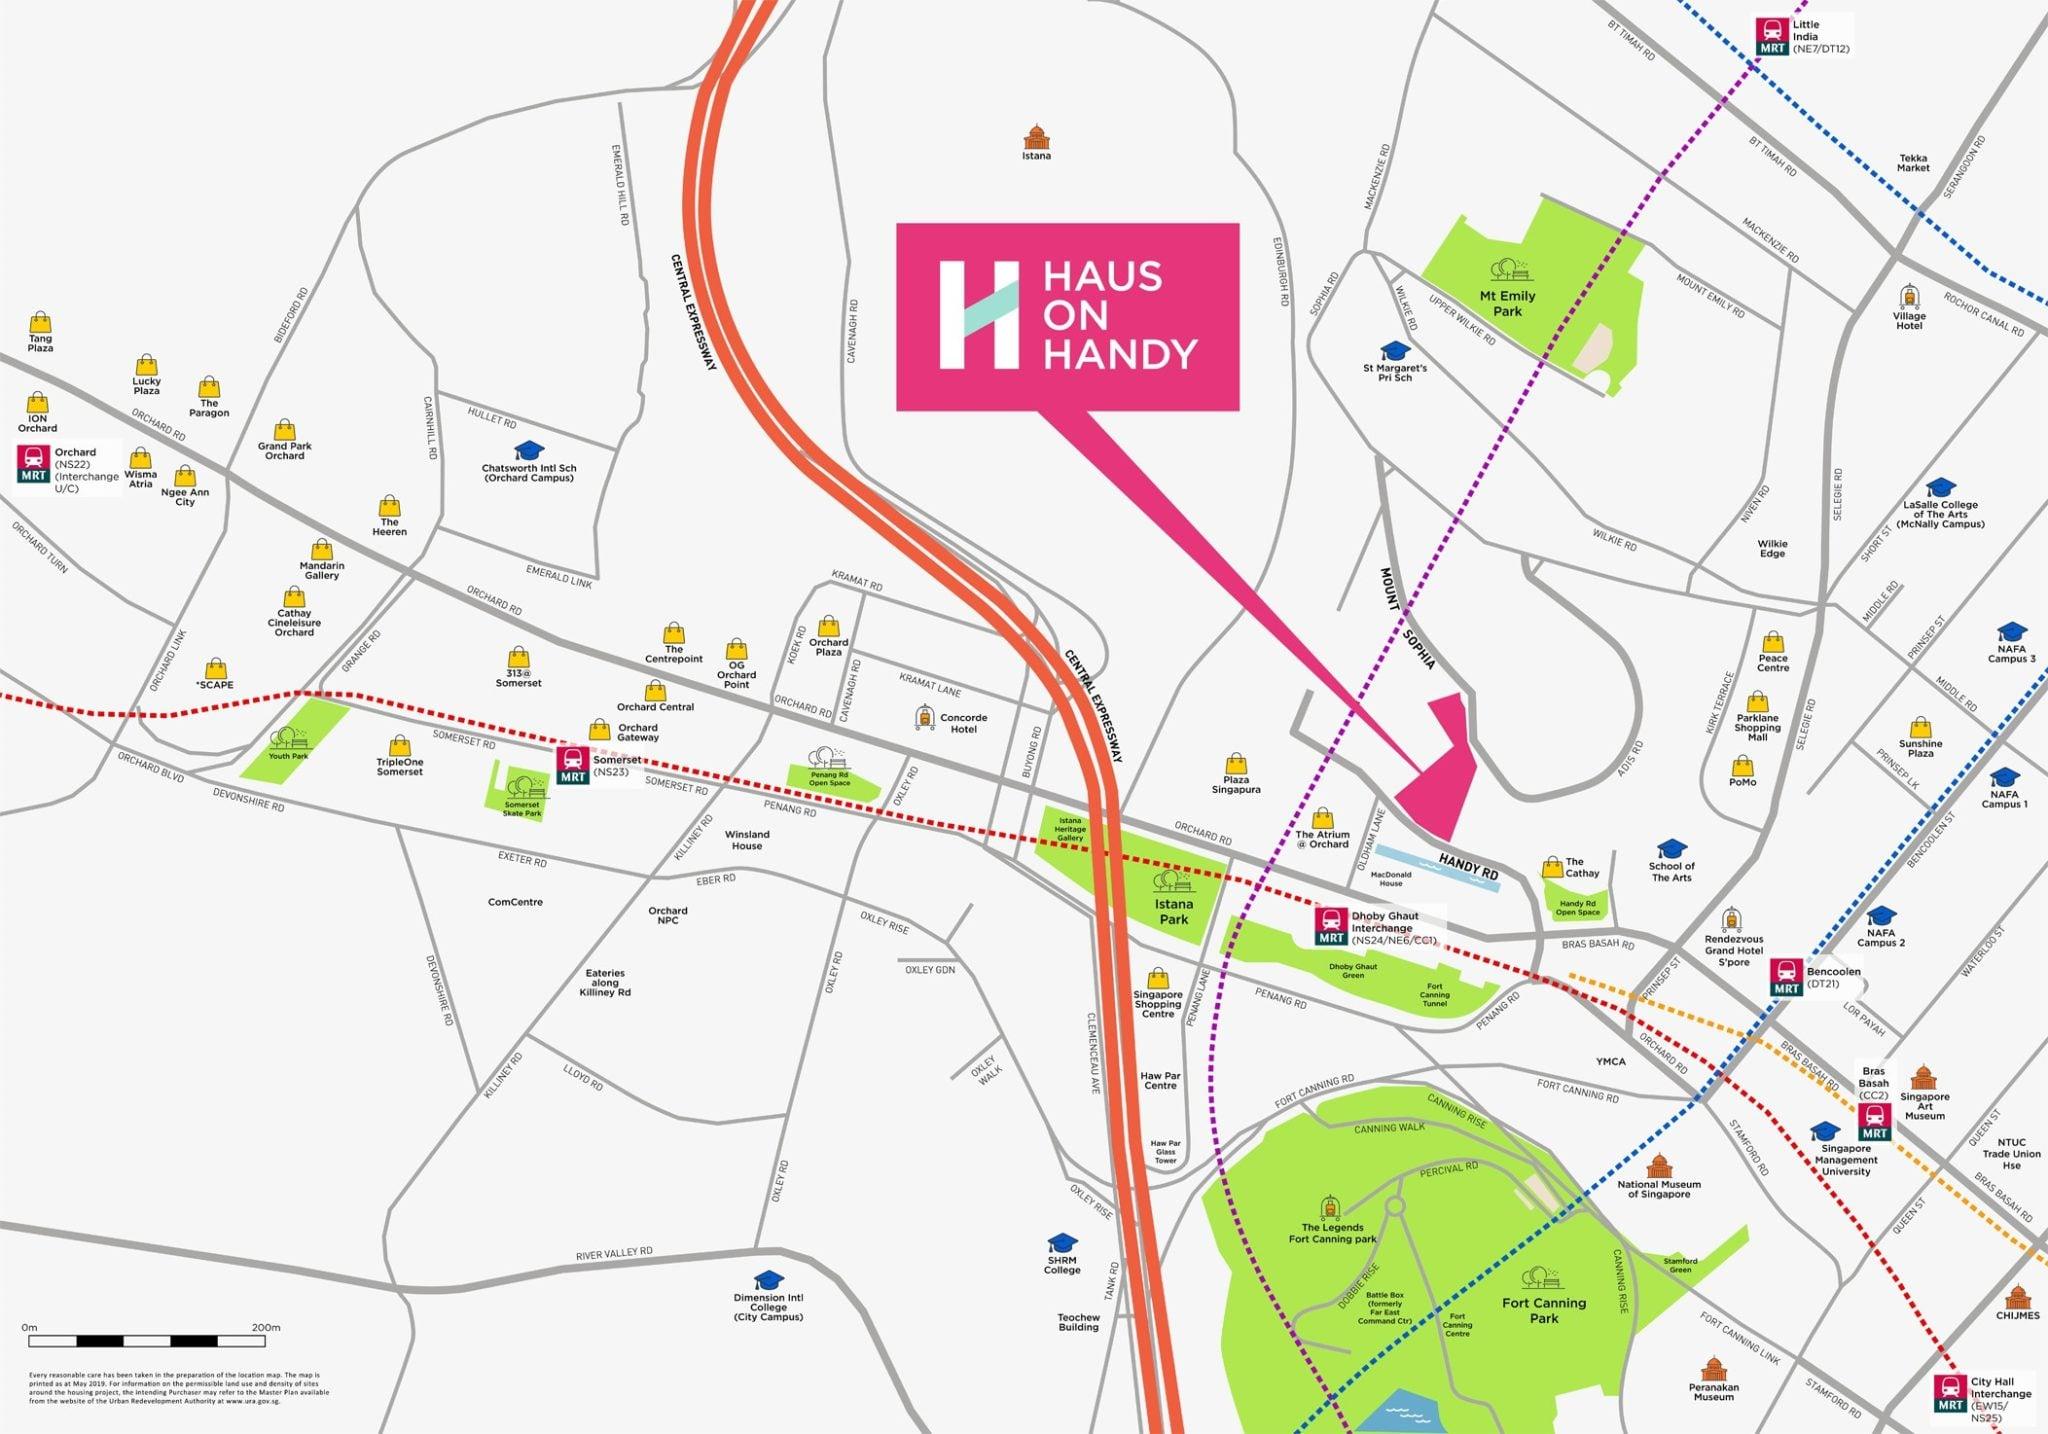 Haus-Location-Map